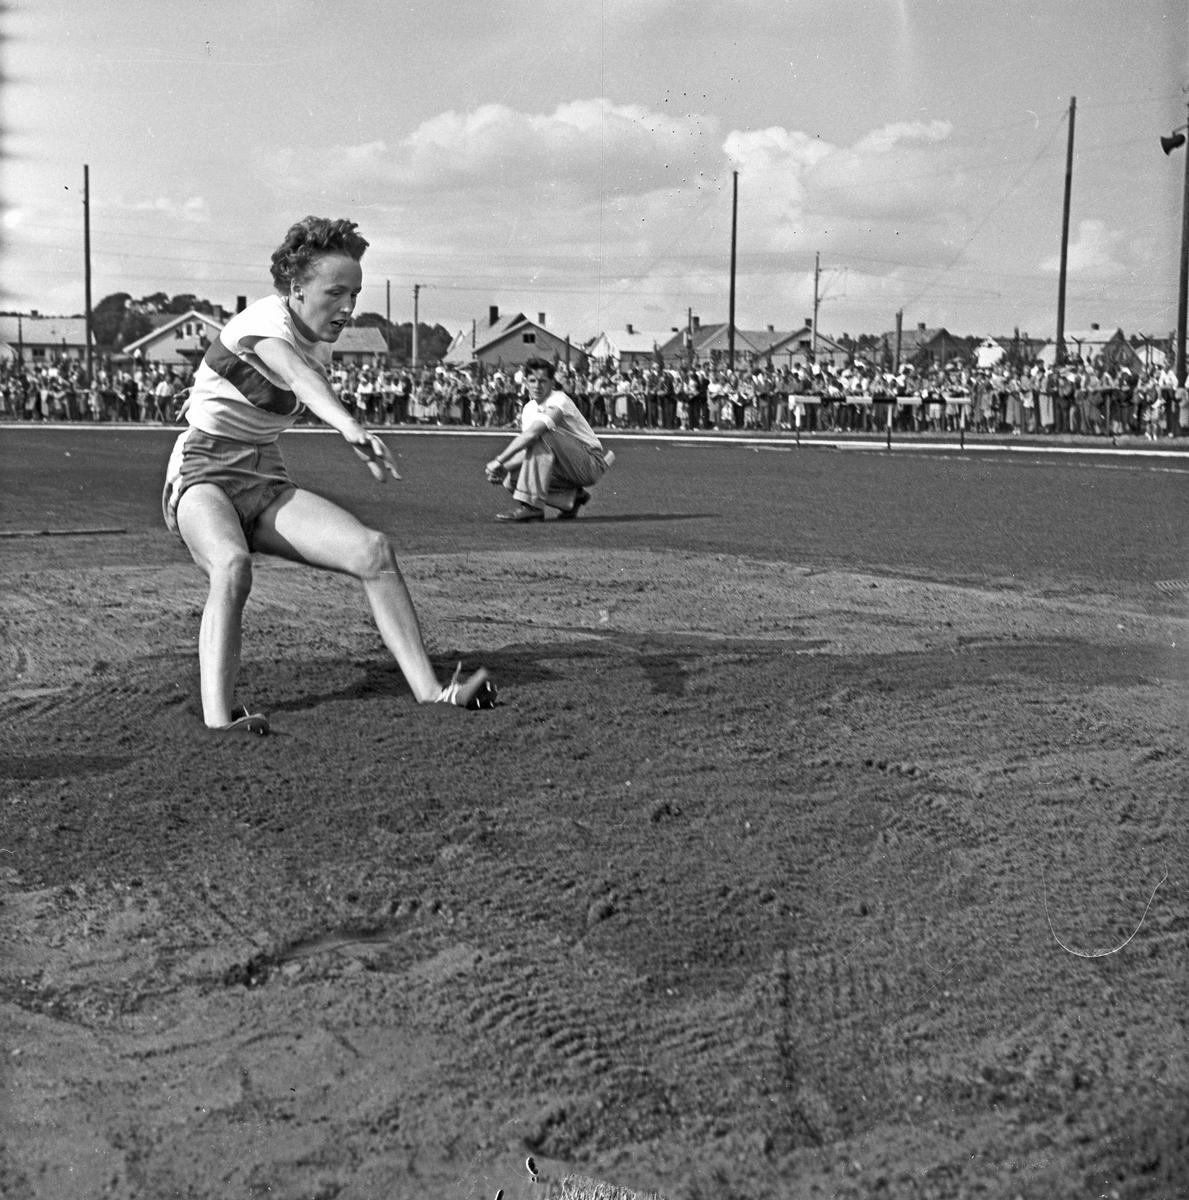 Serie. Norgesmesterskap i friidrett, Sarpsborg, Østfold. Fotografert 1954.